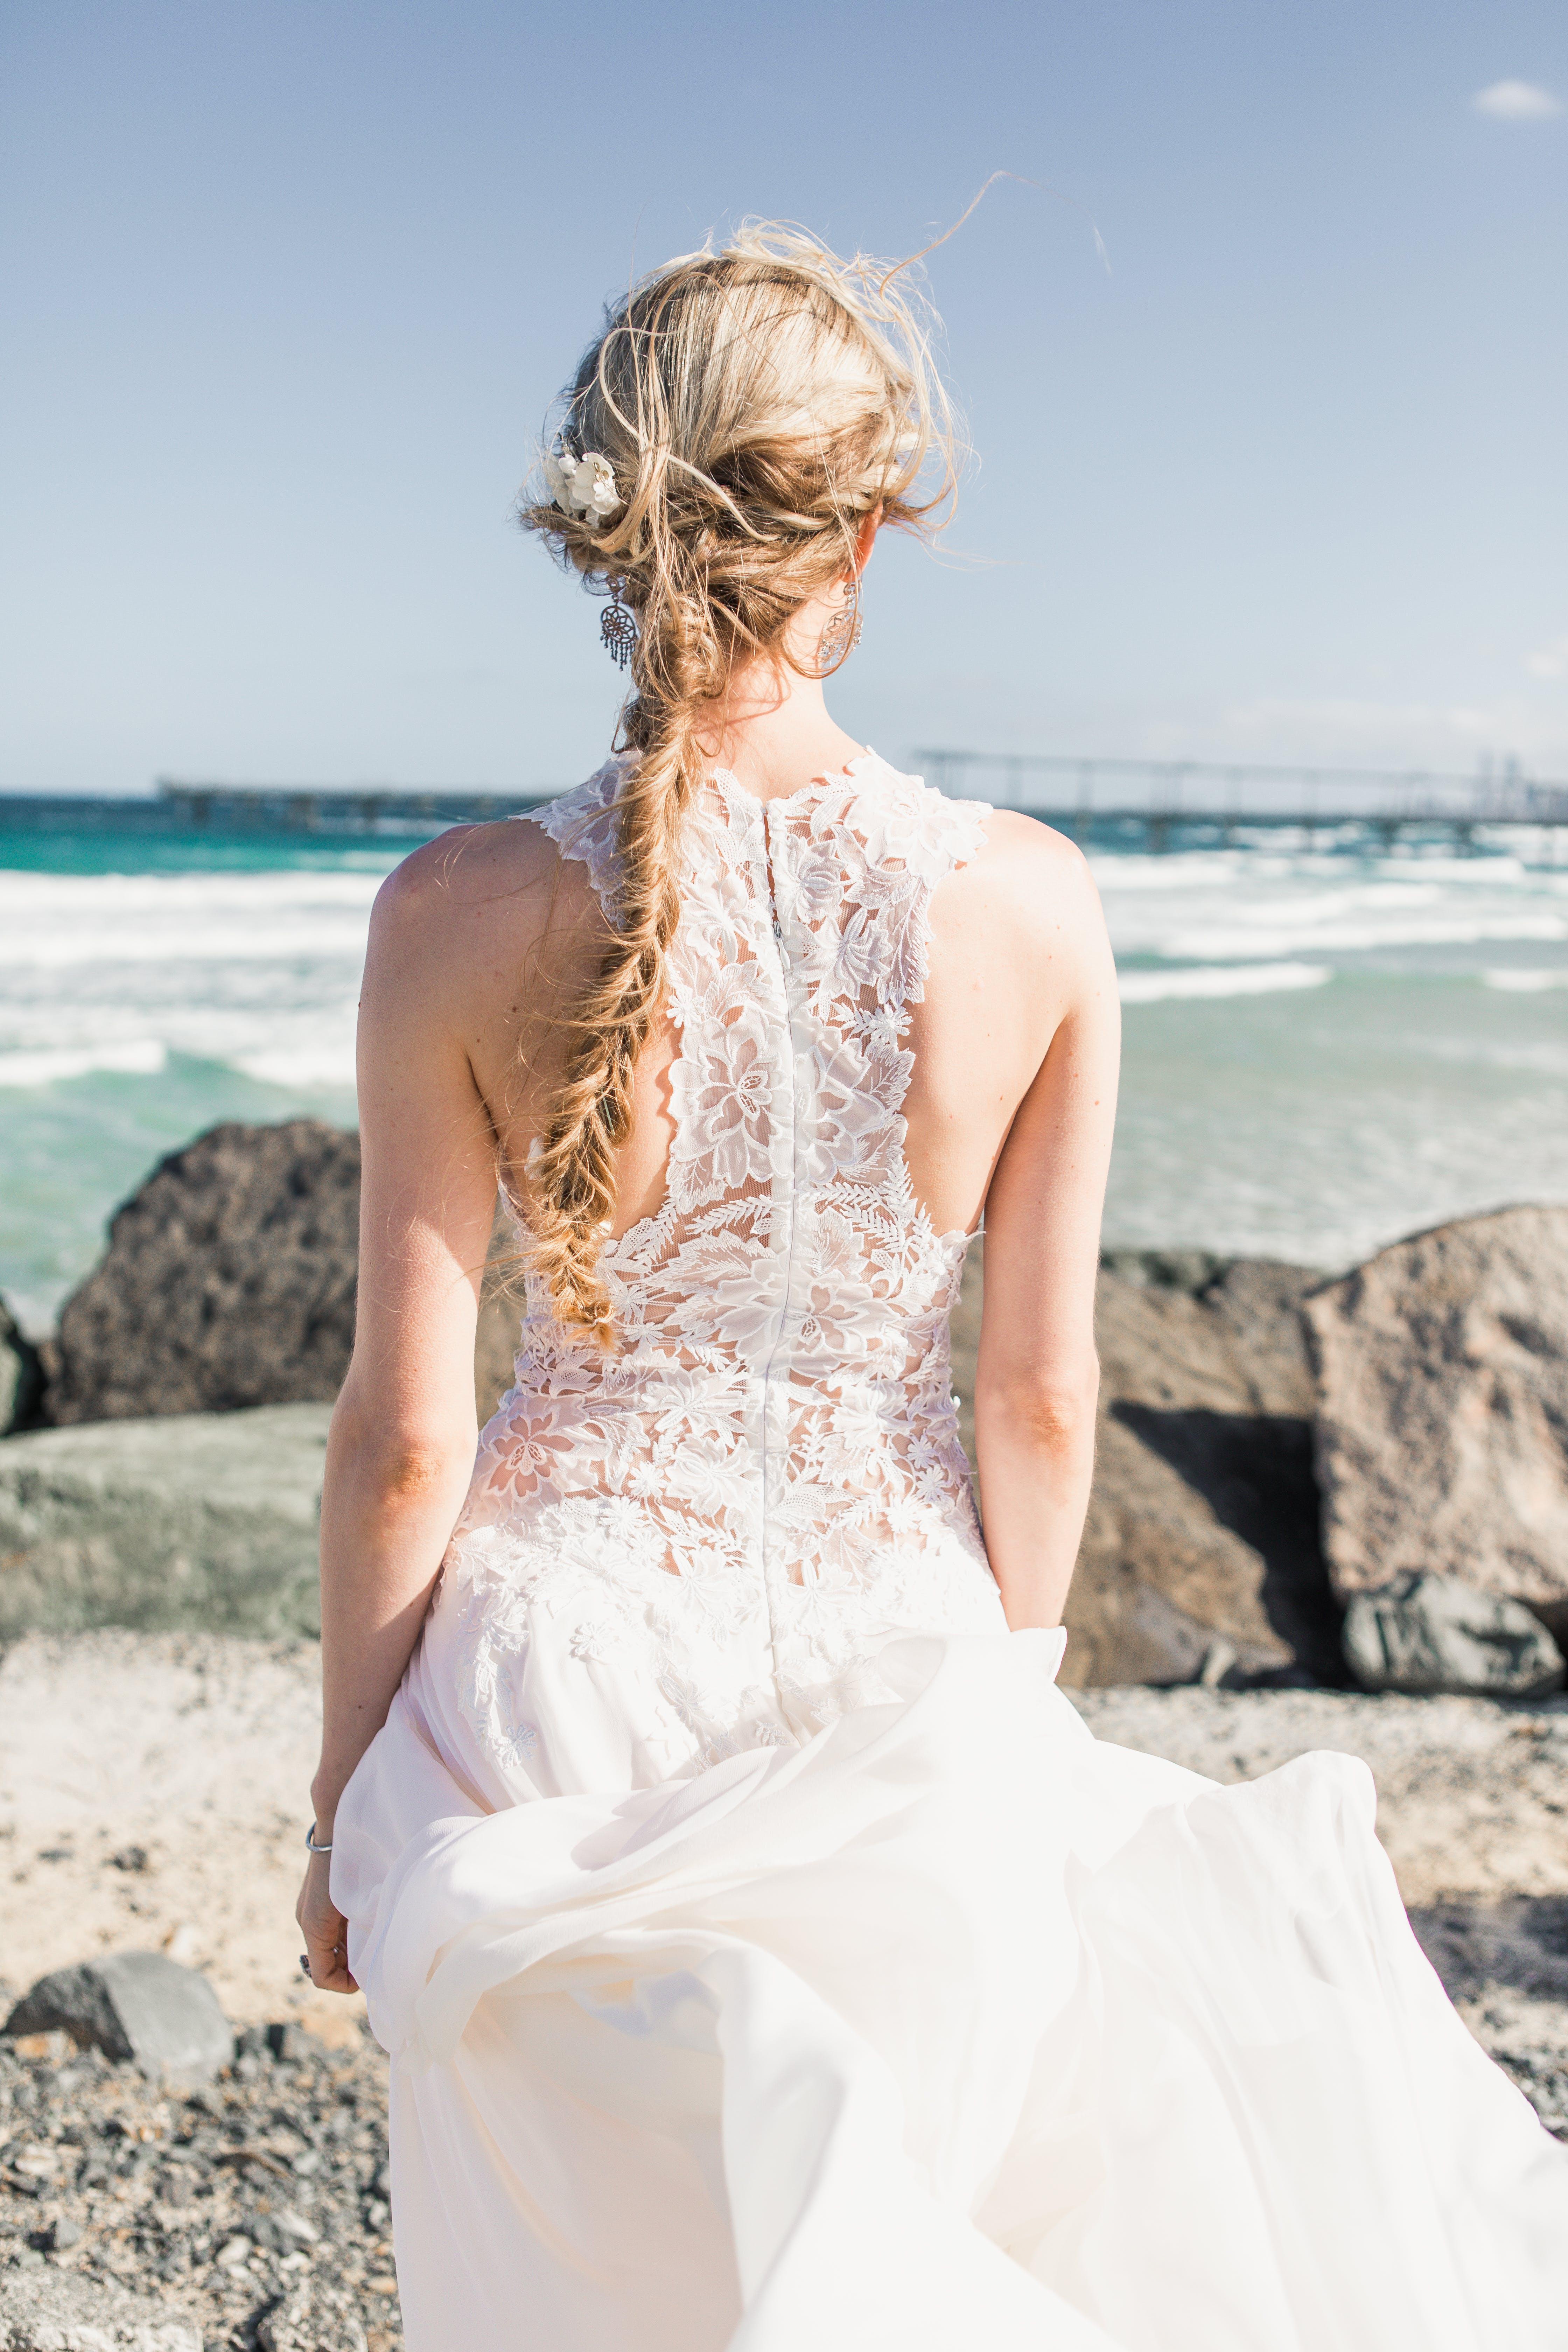 Fotos de stock gratuitas de Boda, mujer, novia, persona